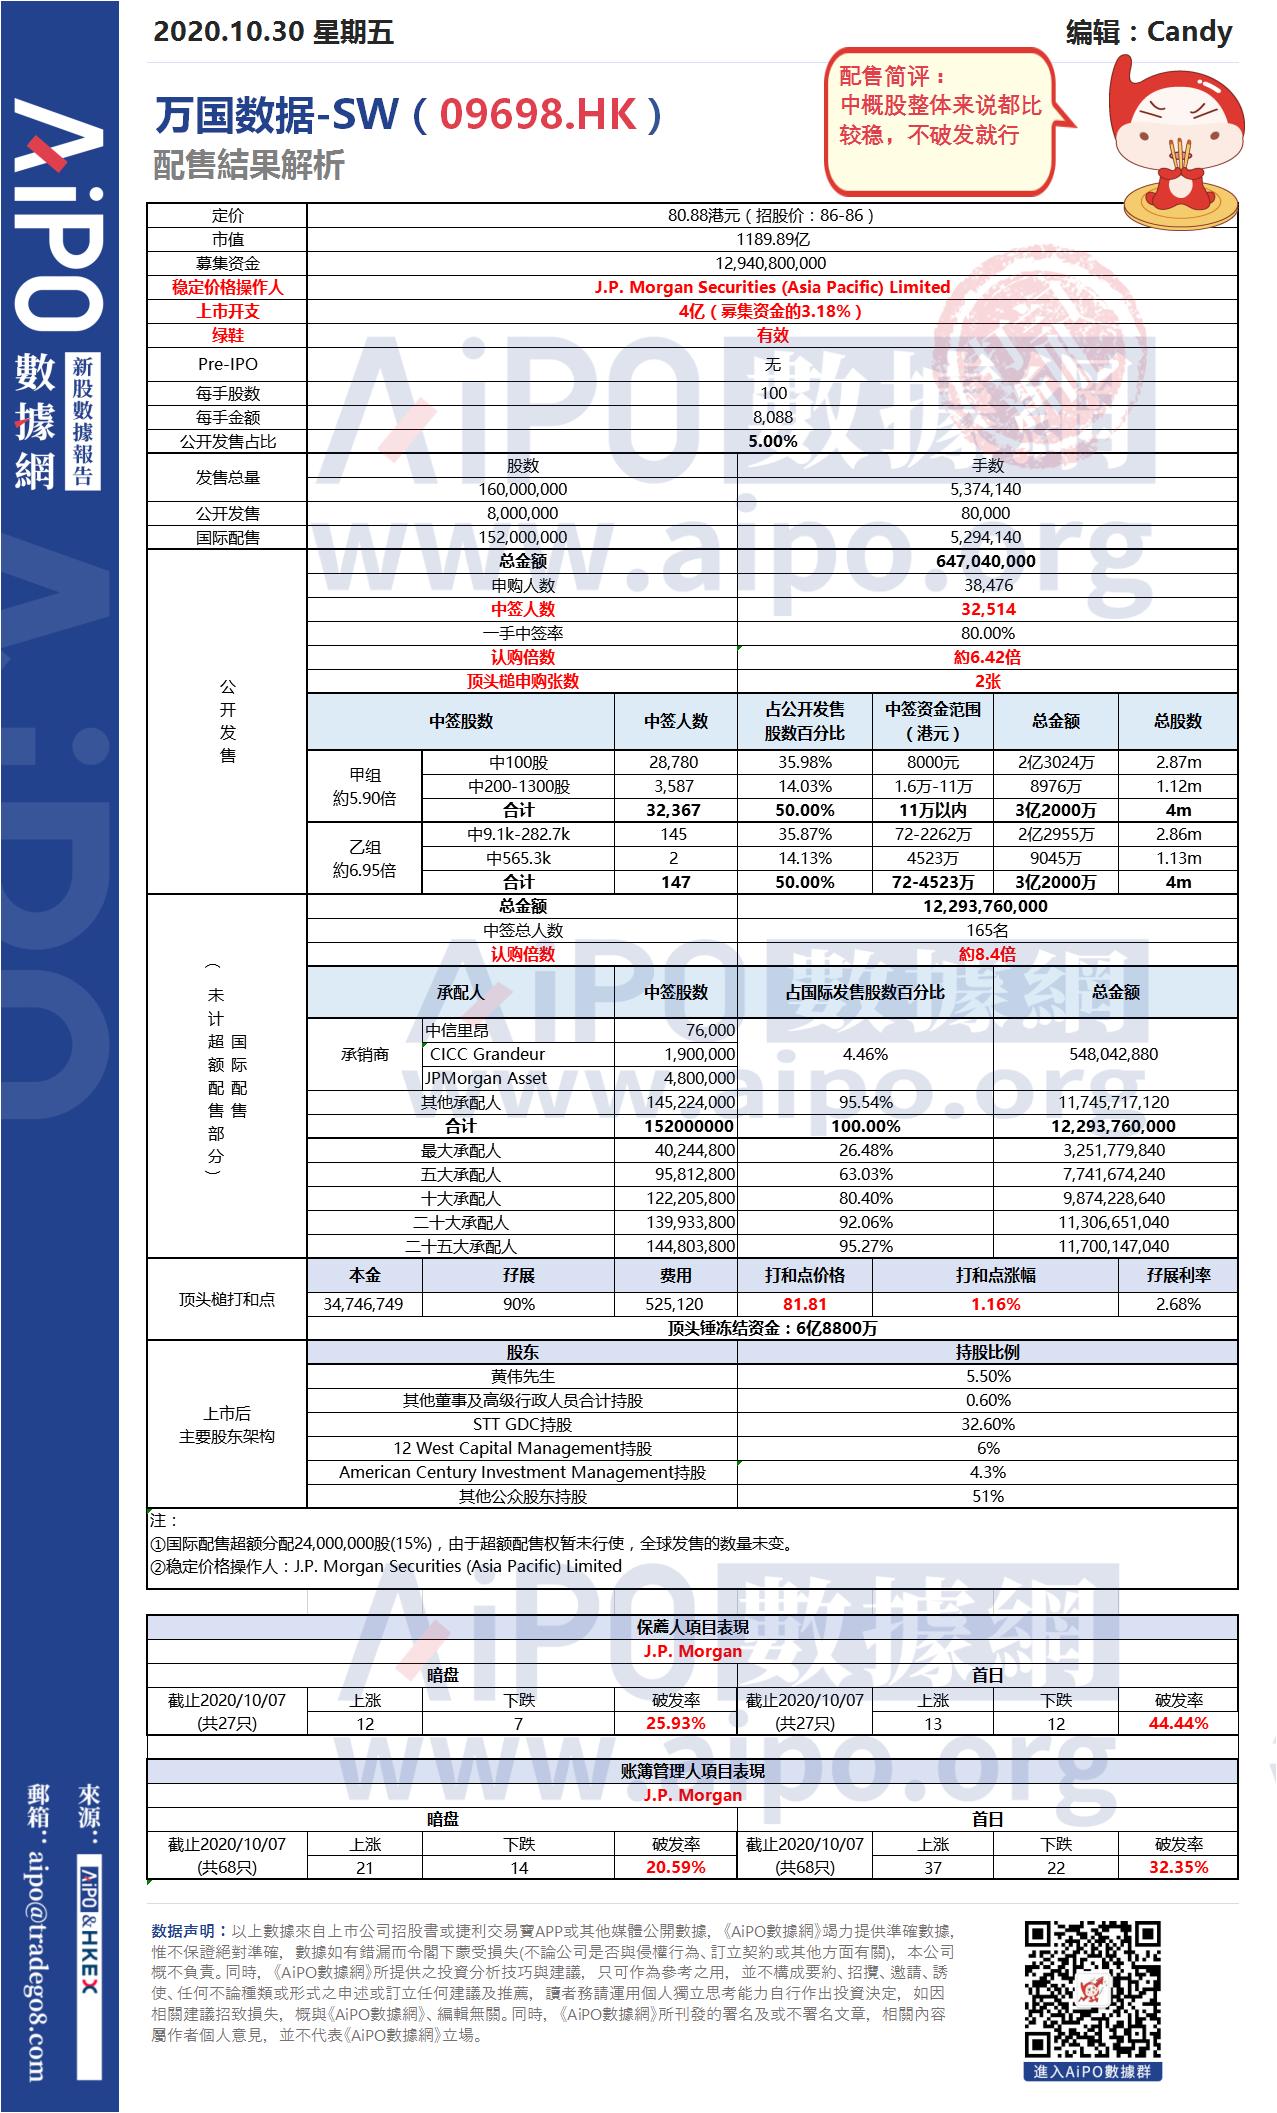 【新股AiPO】配售結果解析:萬國數據-SW(09698.HK).png